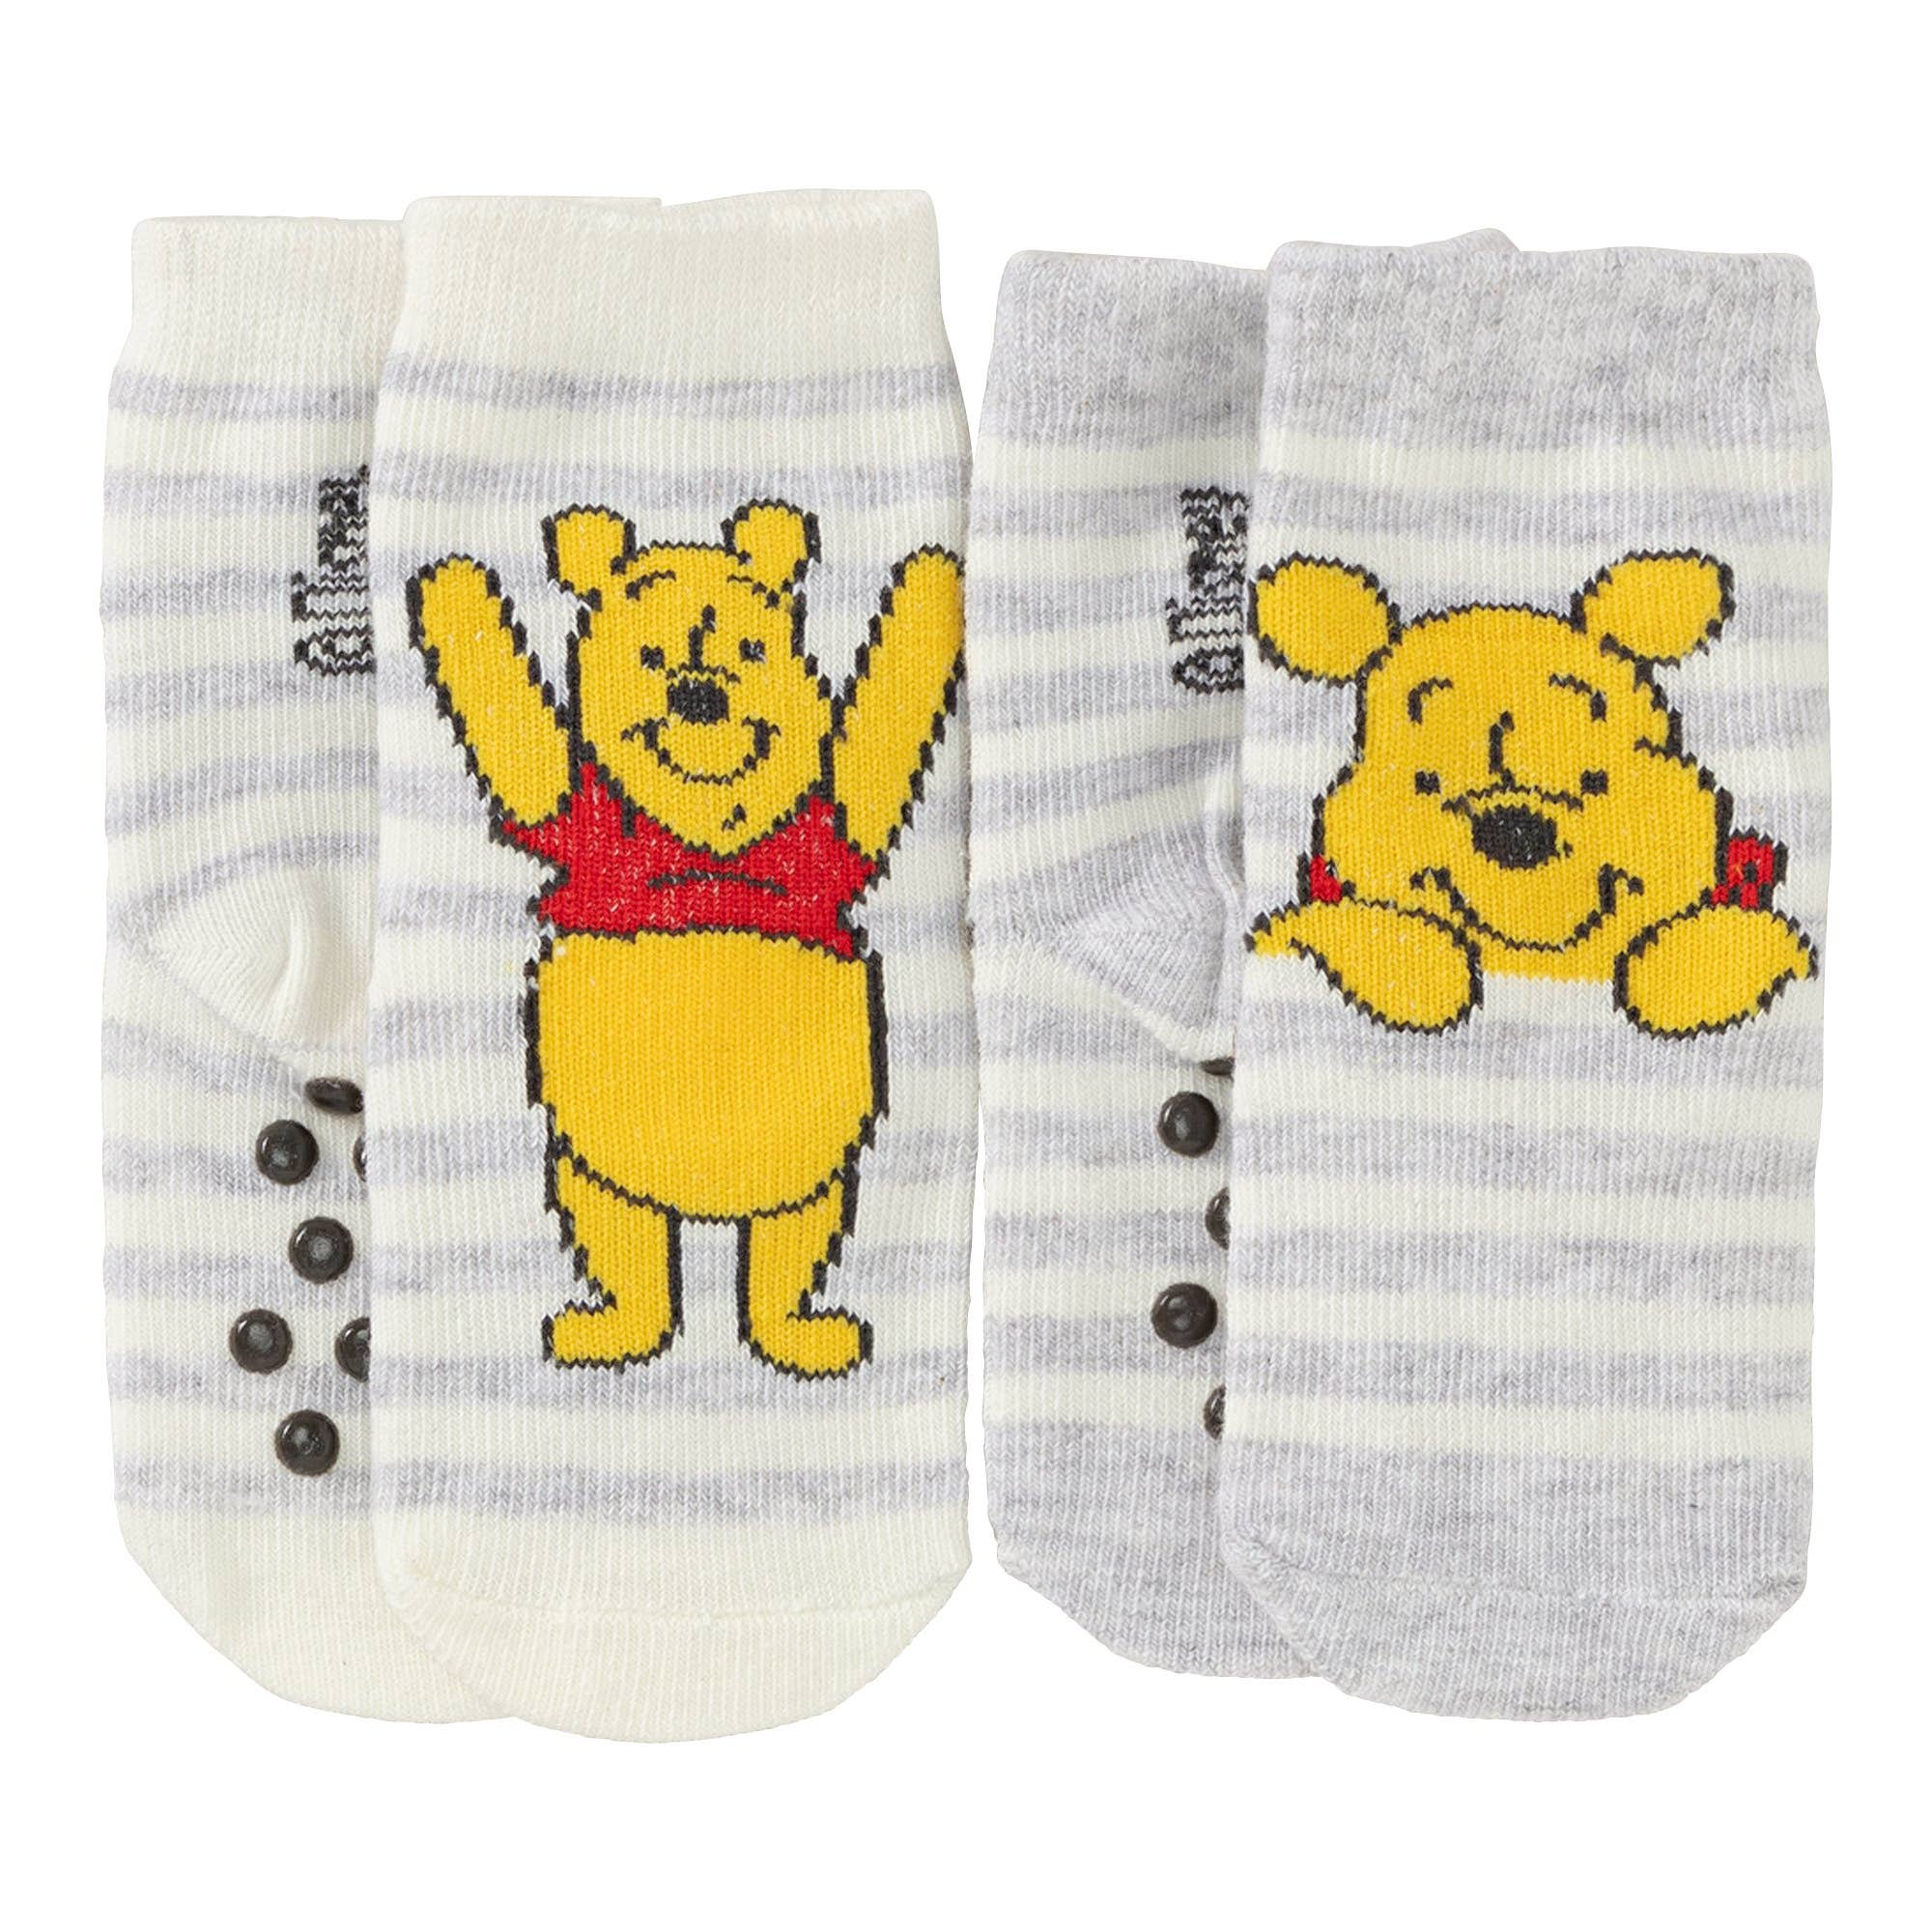 62-92 2er Pack Jungen Baby Socken blau oder grau Gr